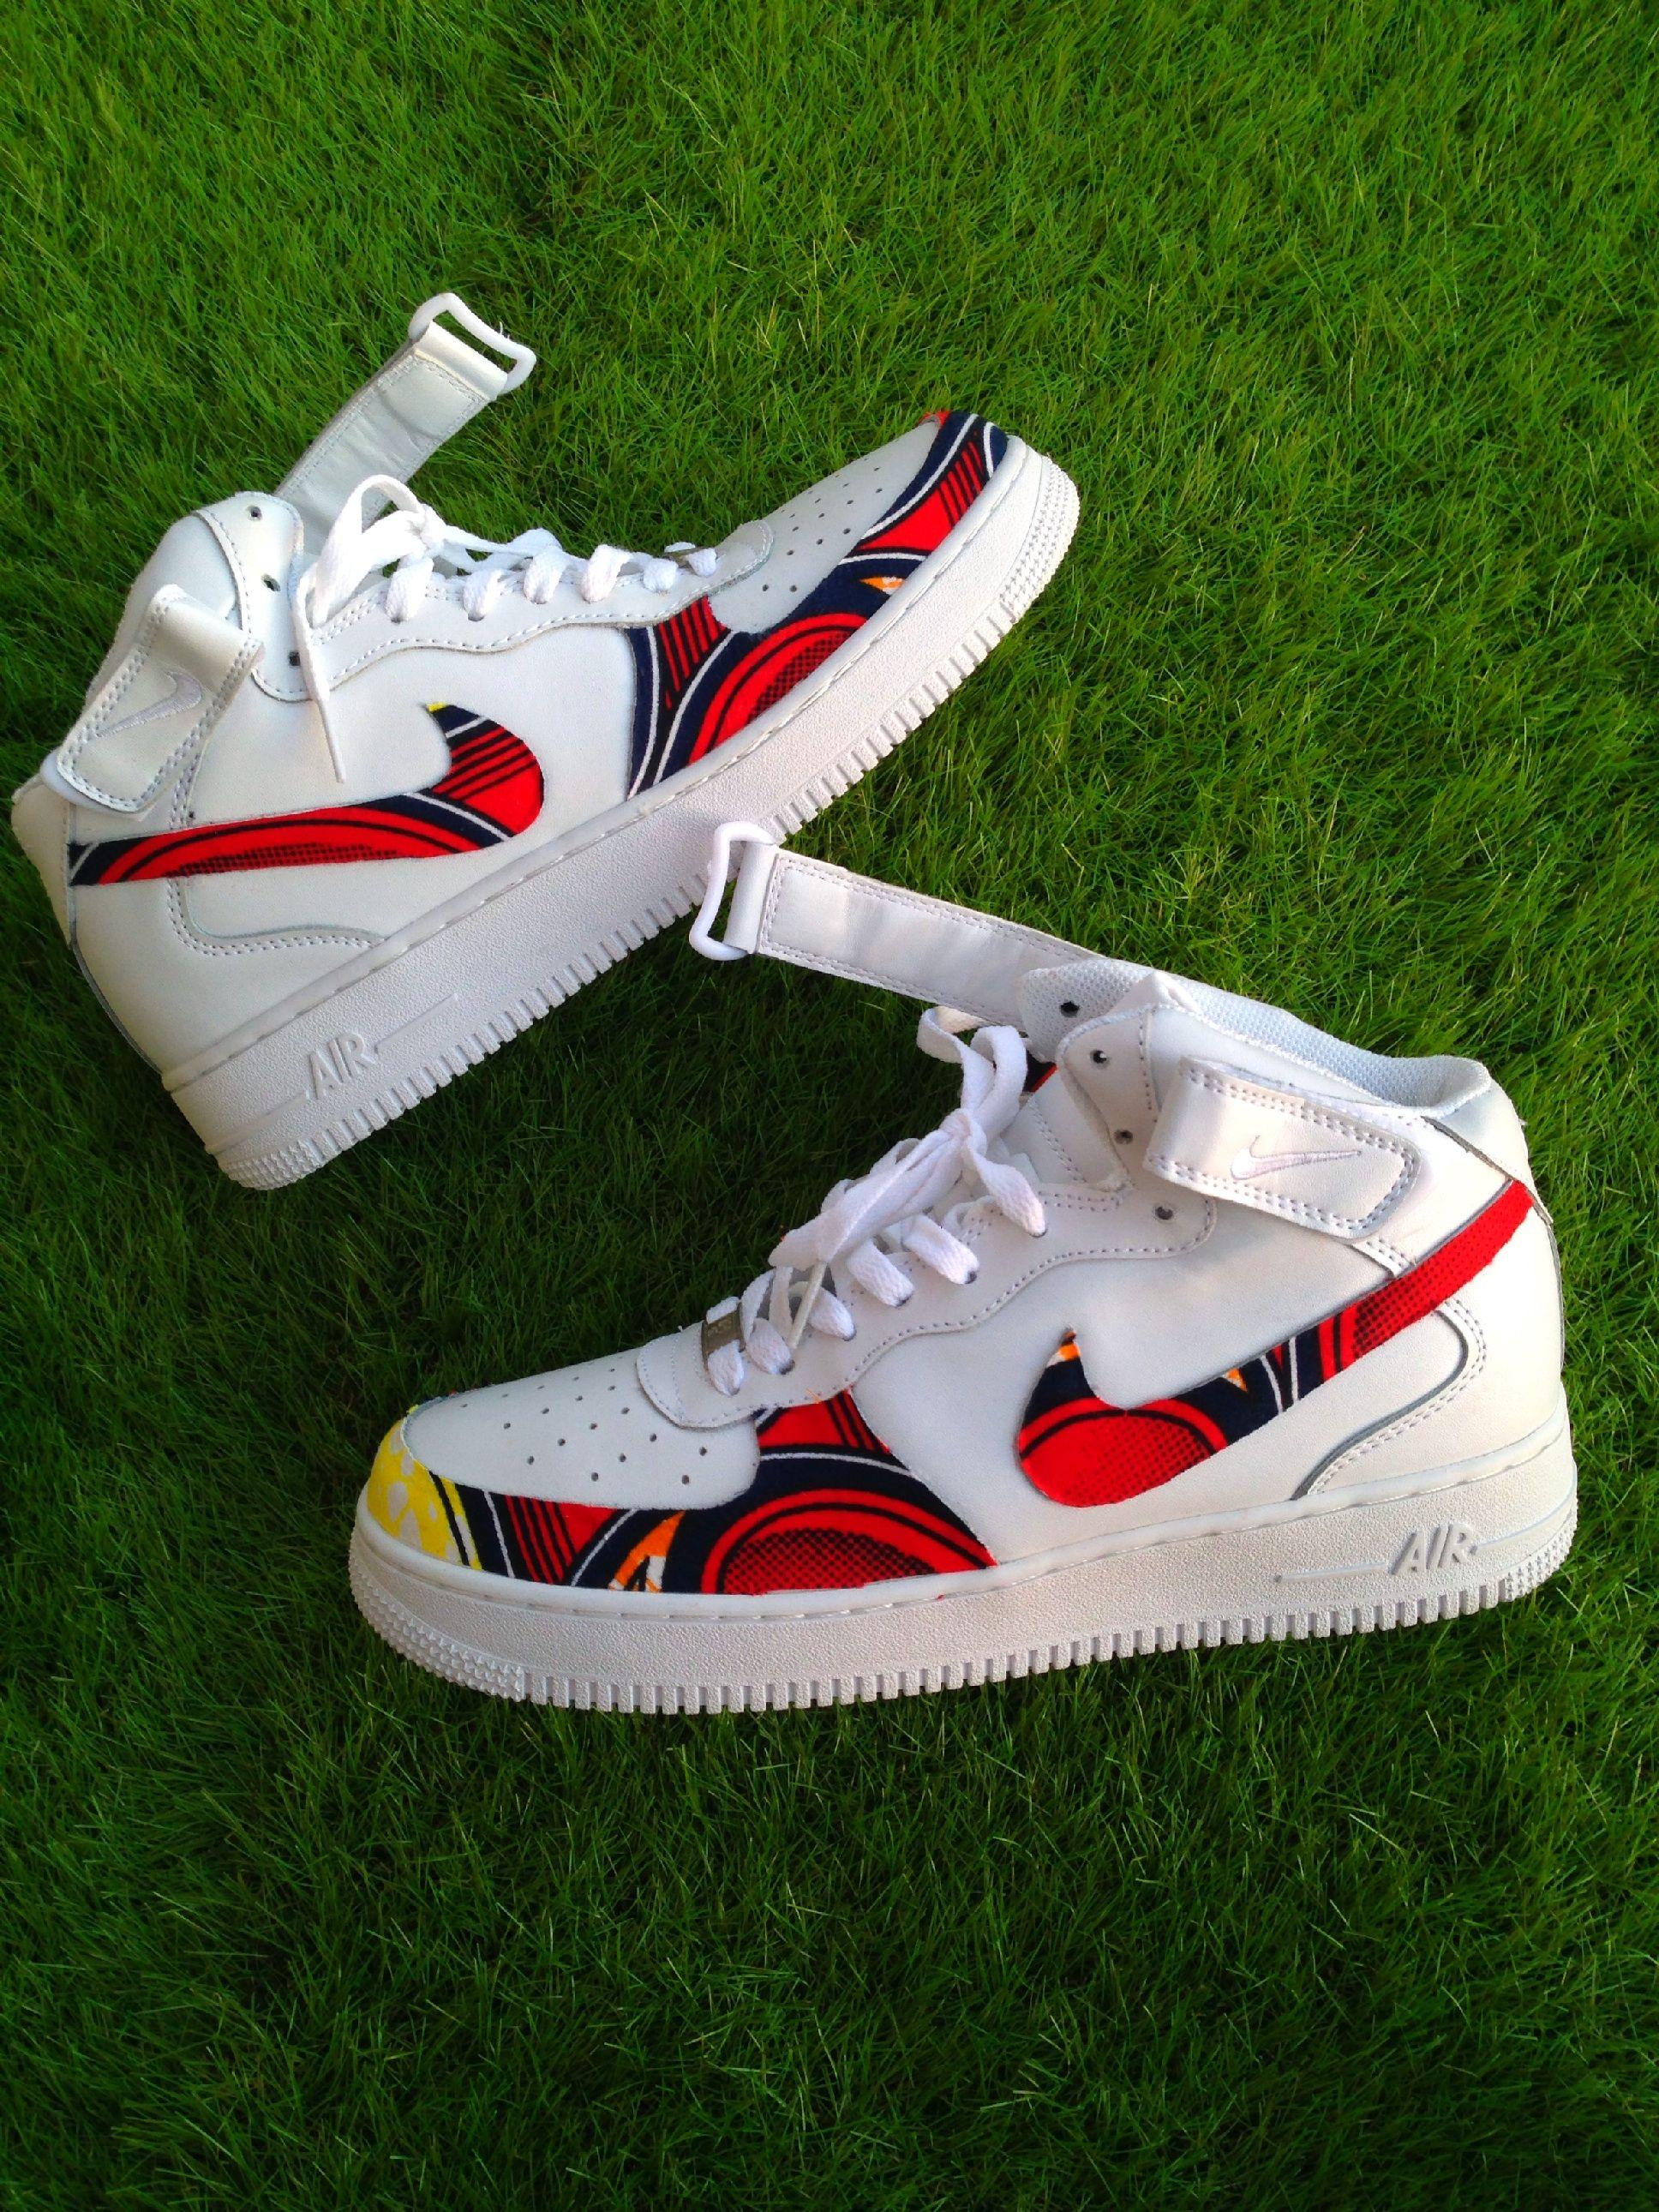 brand new 32876 292d2 Air Force One Red Wax Ankara Waxfeller Custom Sneakers Kicks  Fashion Men Women Hommes Femmes Kicks Nike